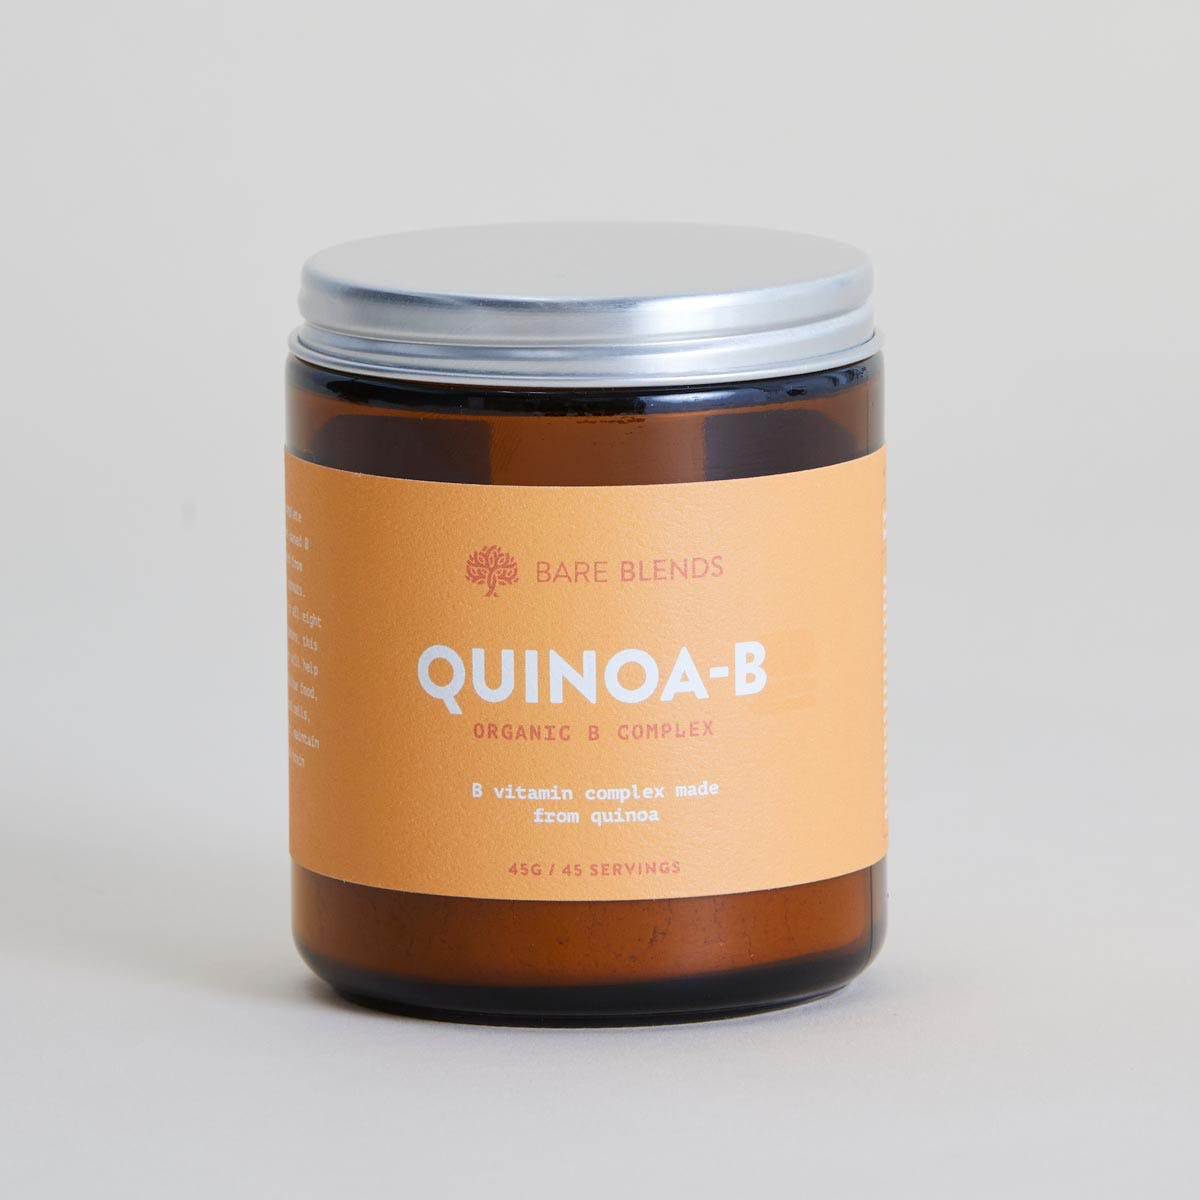 Quinoa-B by Bare Blends